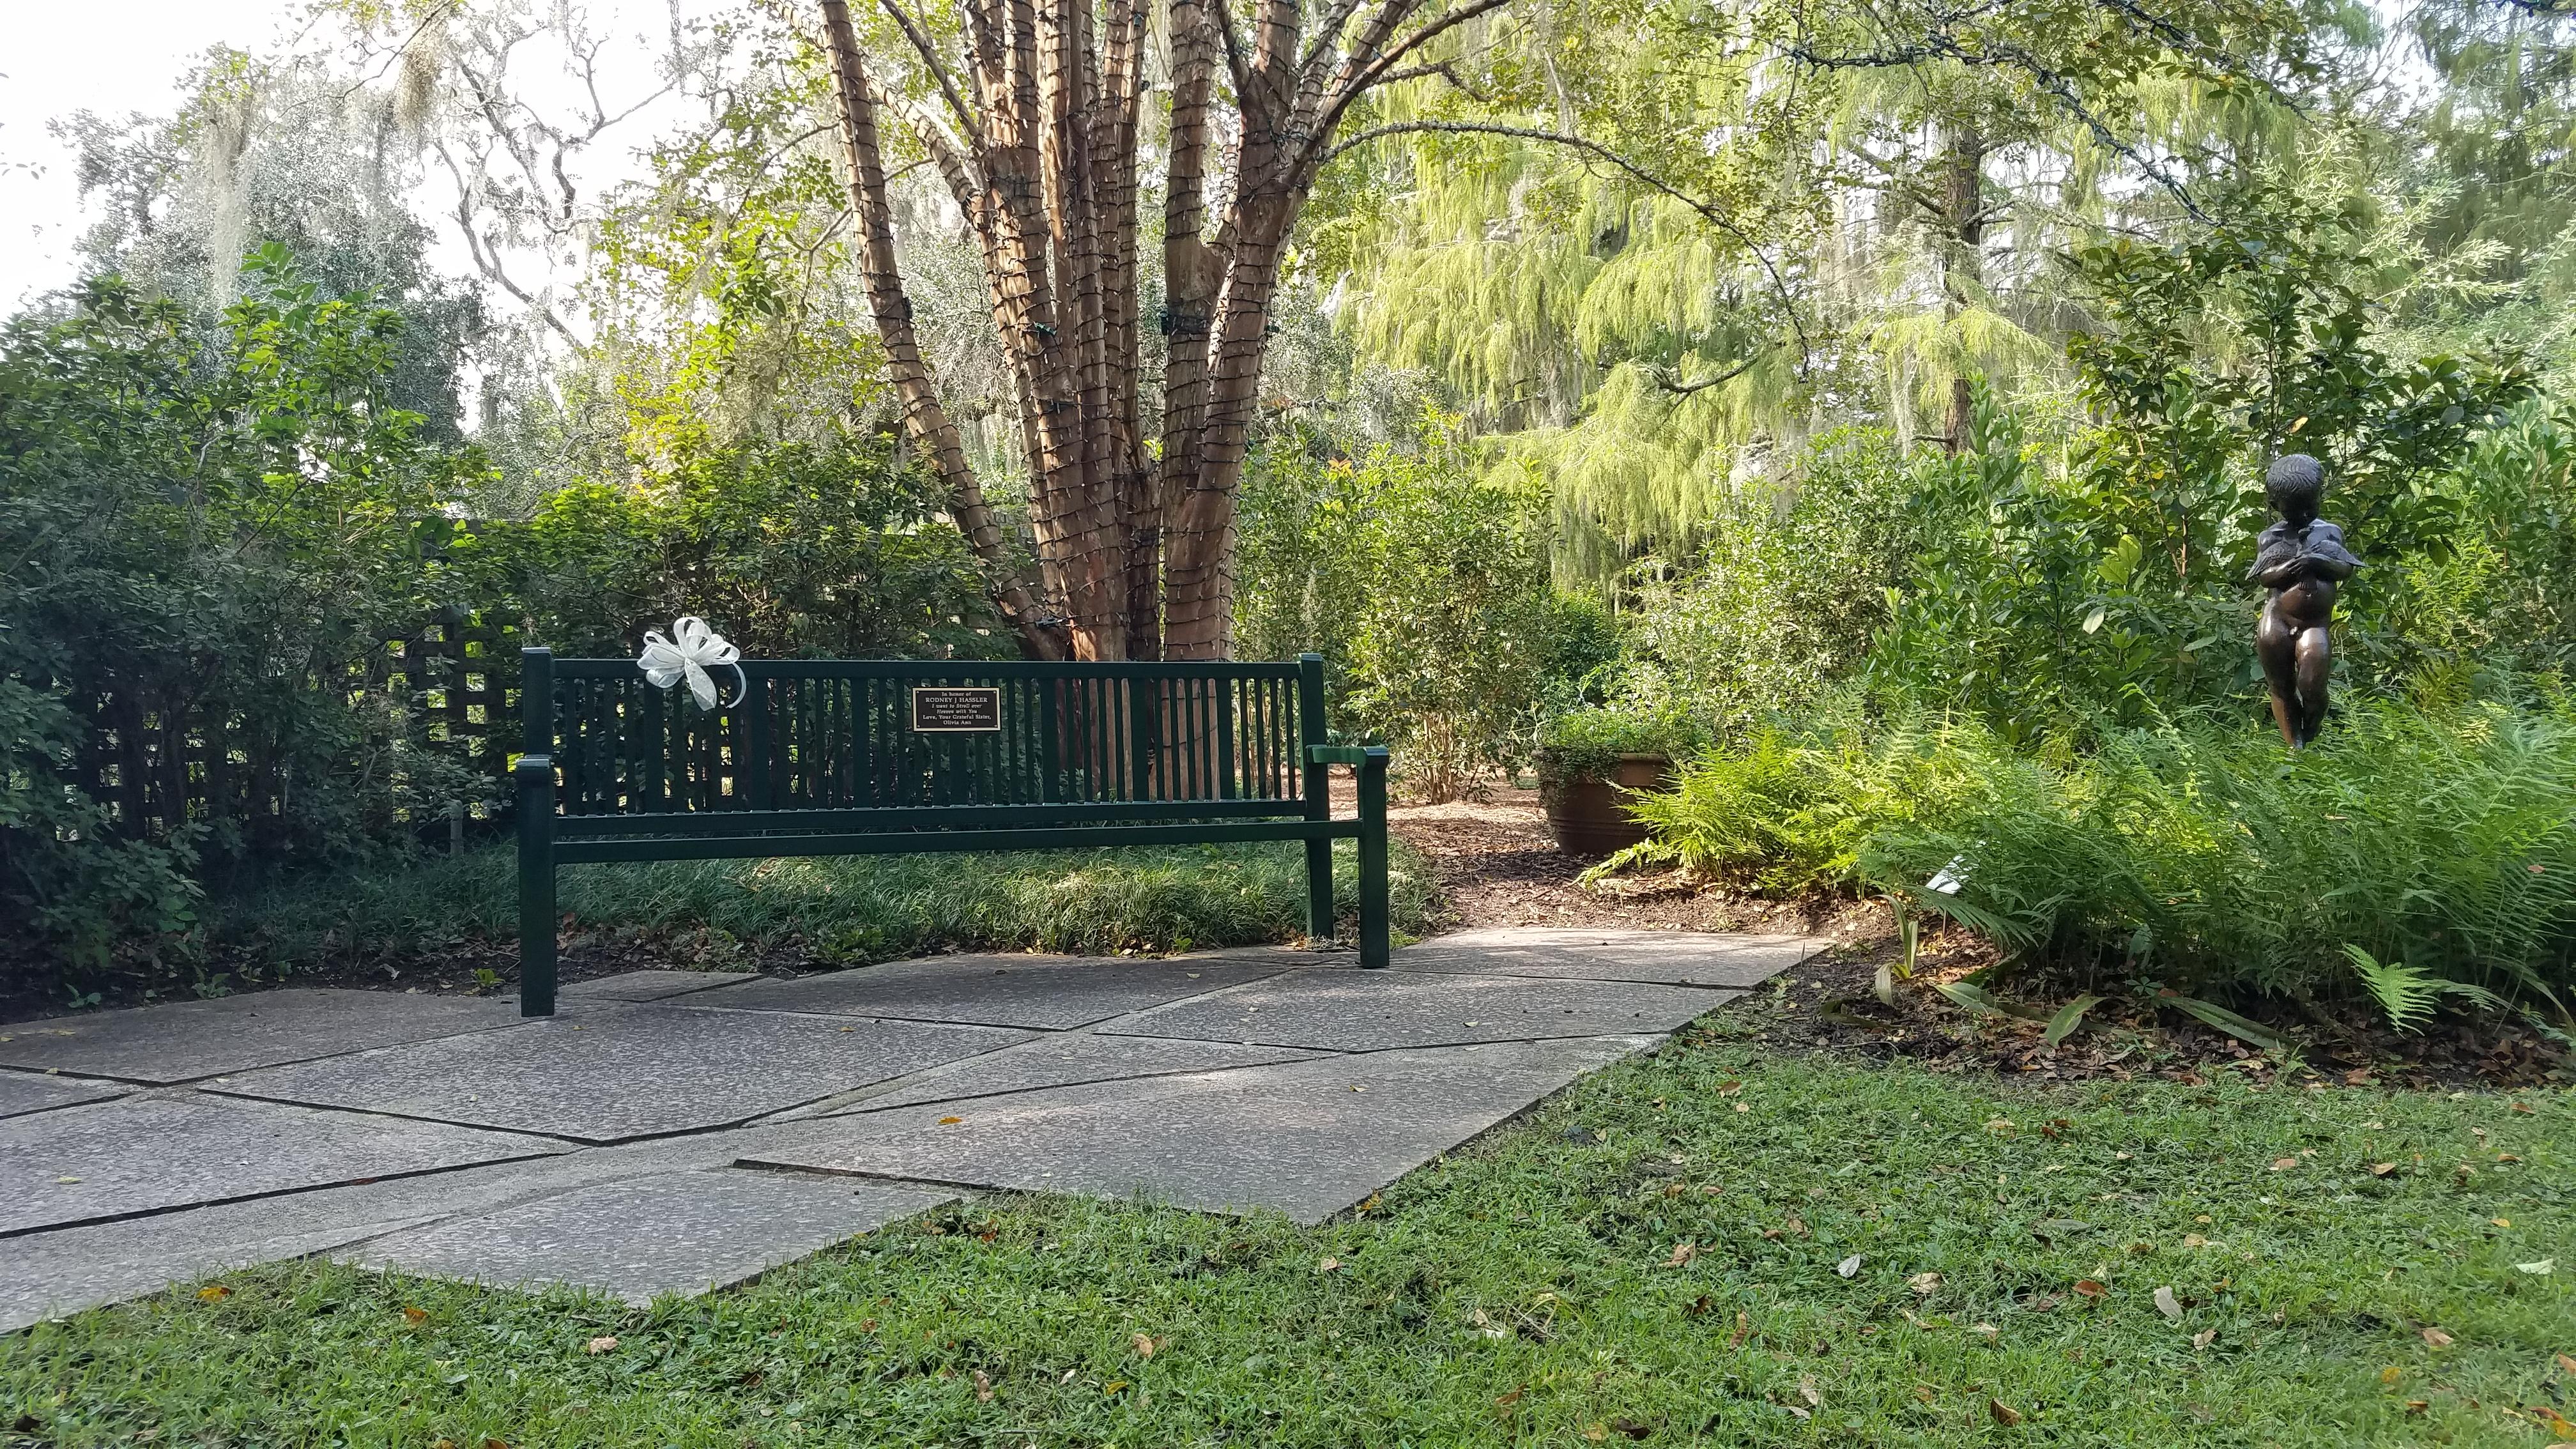 Dedication Bench at Brookgreen Gardens